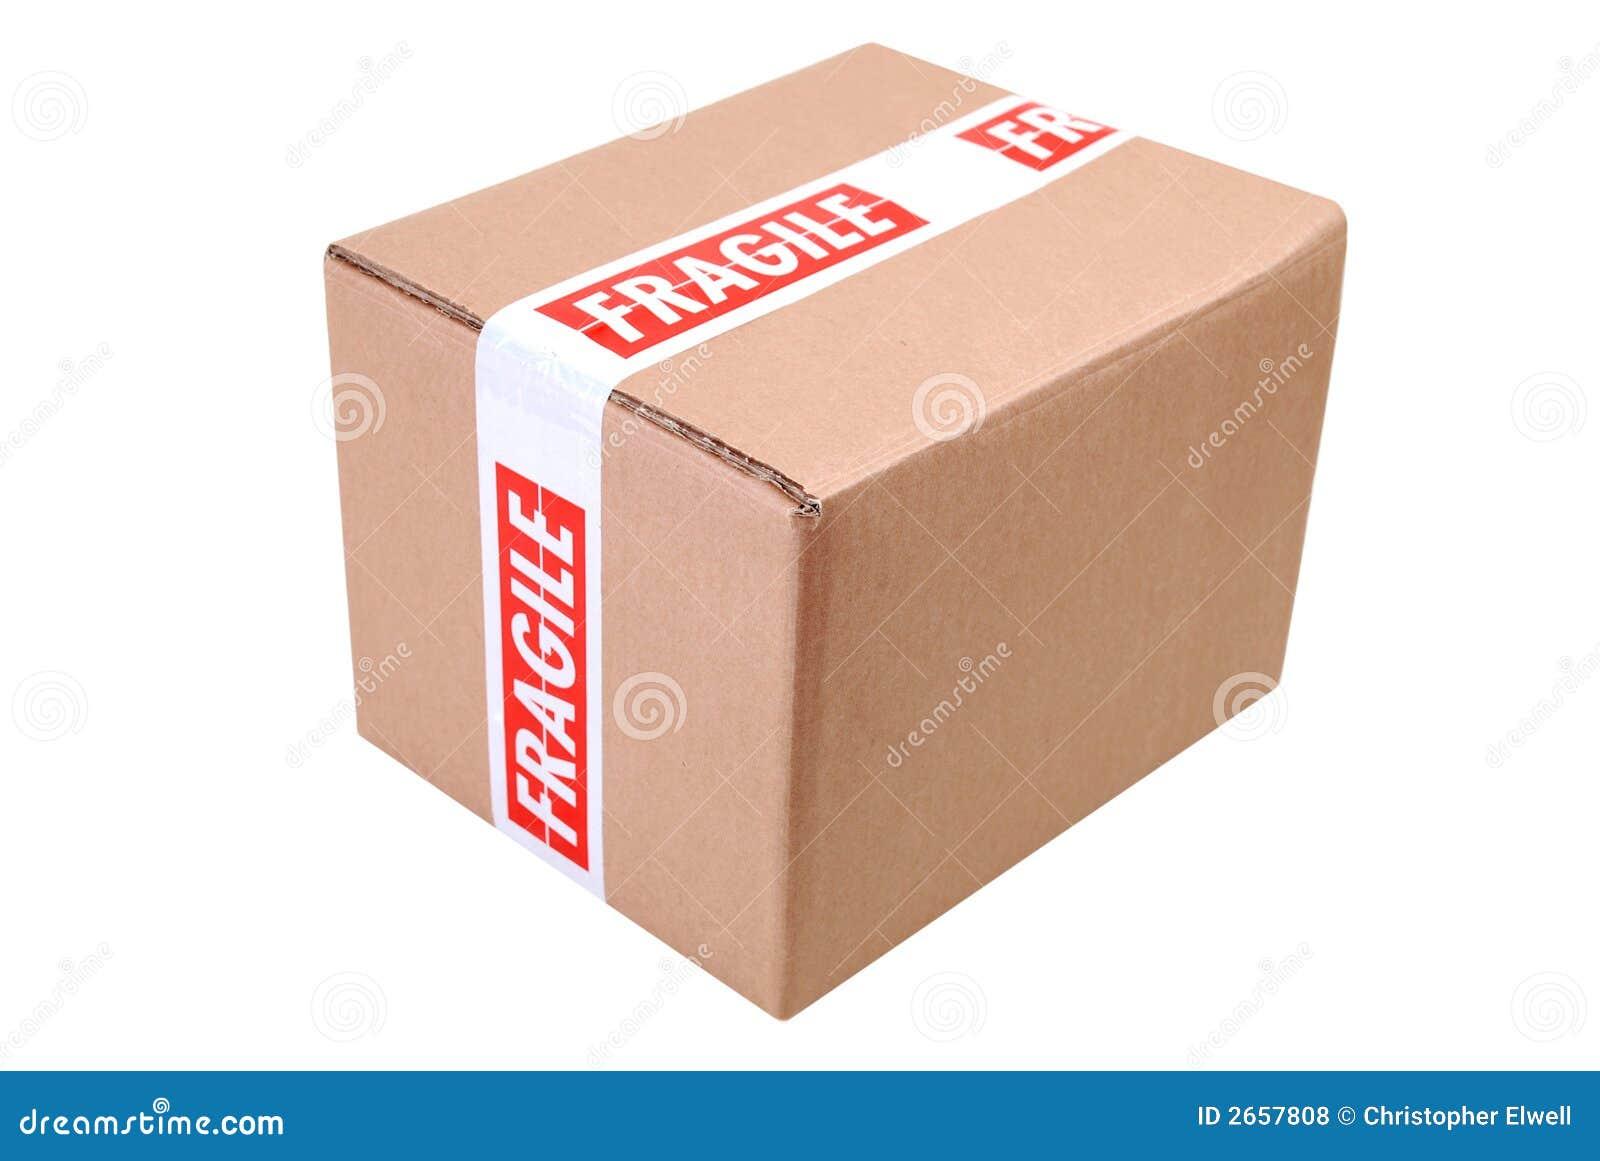 cardboard box and fragile tape stock photo image of despatch moving 2657808. Black Bedroom Furniture Sets. Home Design Ideas